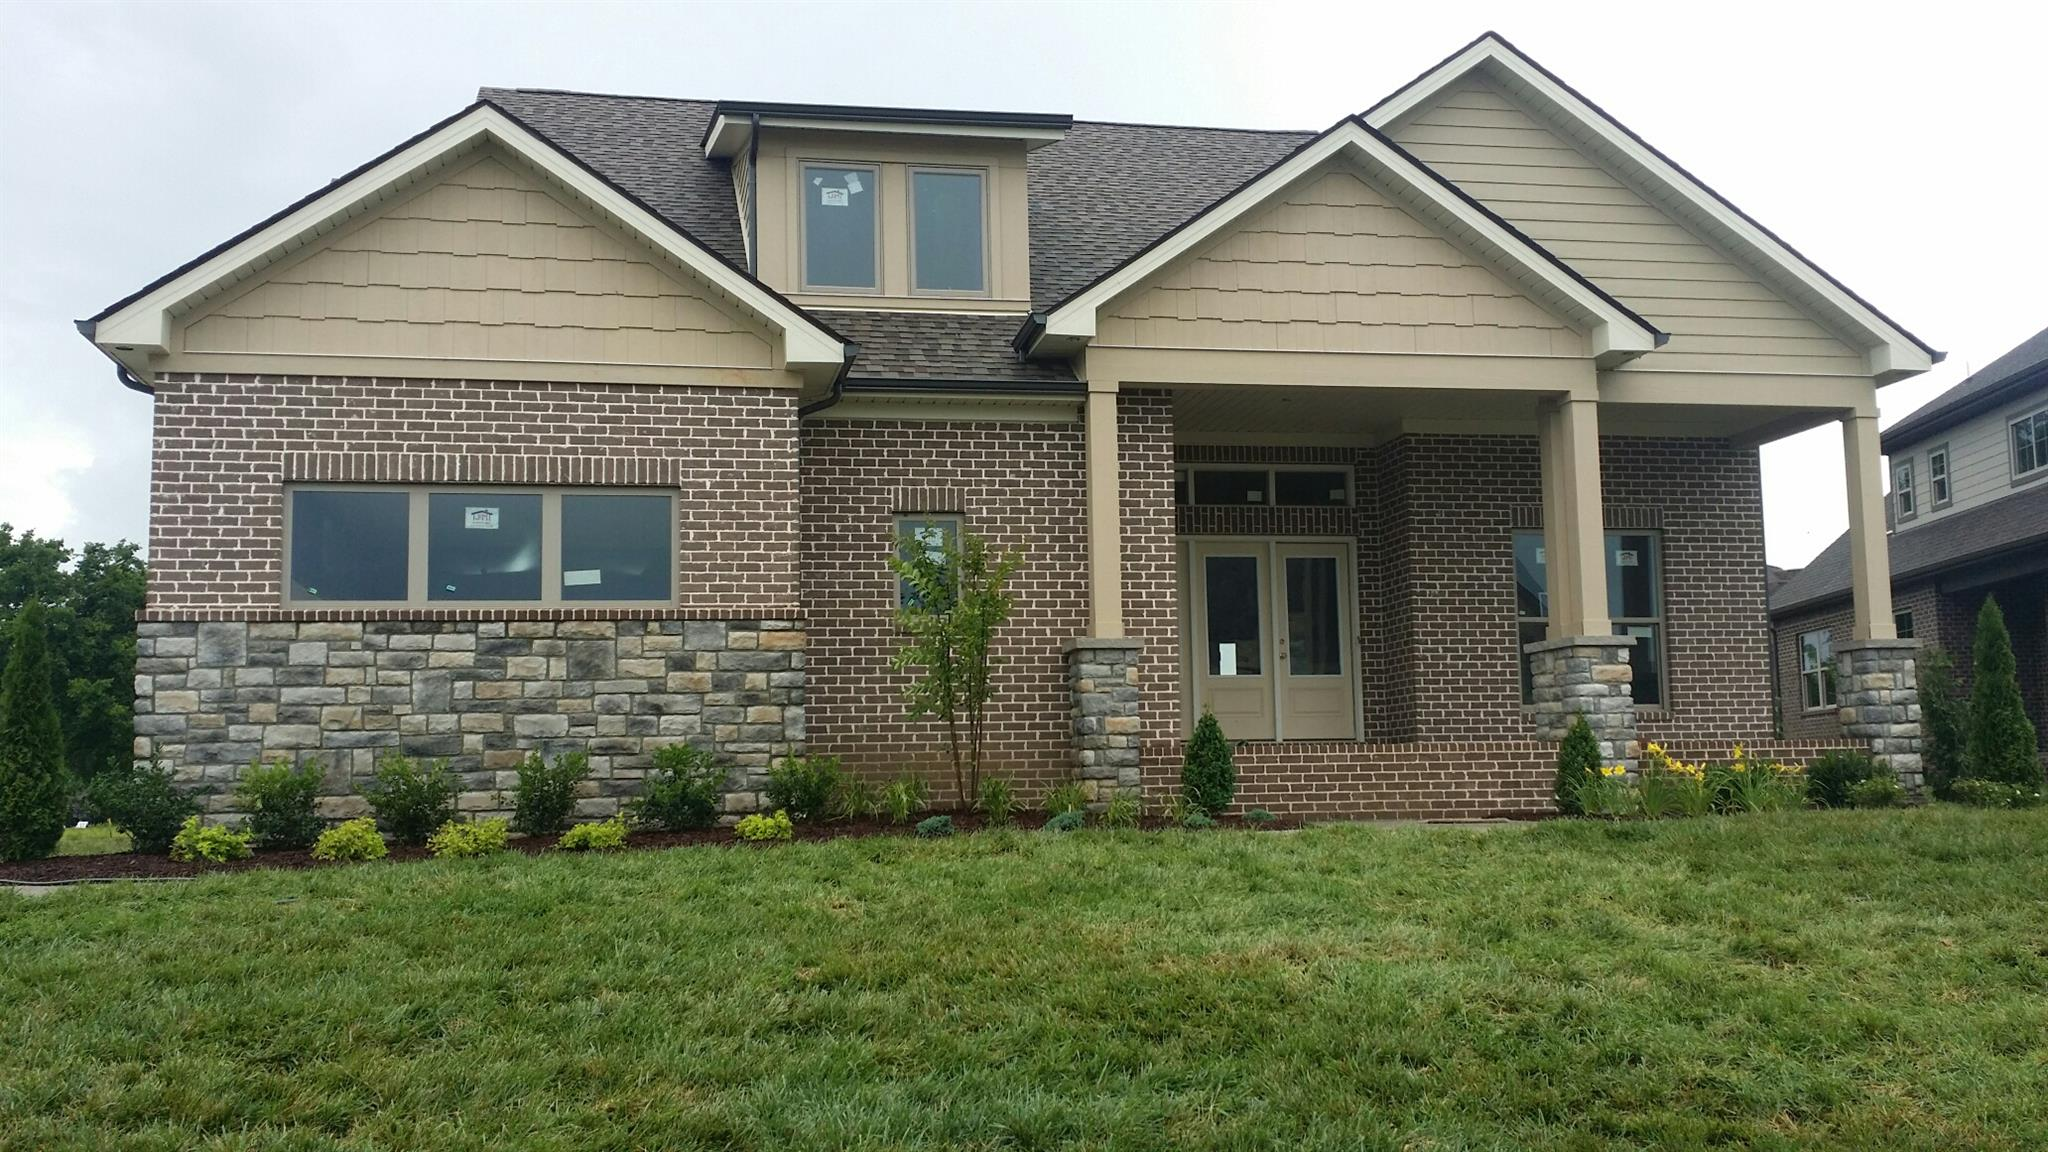 Photo of 5712 Iverson Drive Lot 64  Murfreesboro  TN